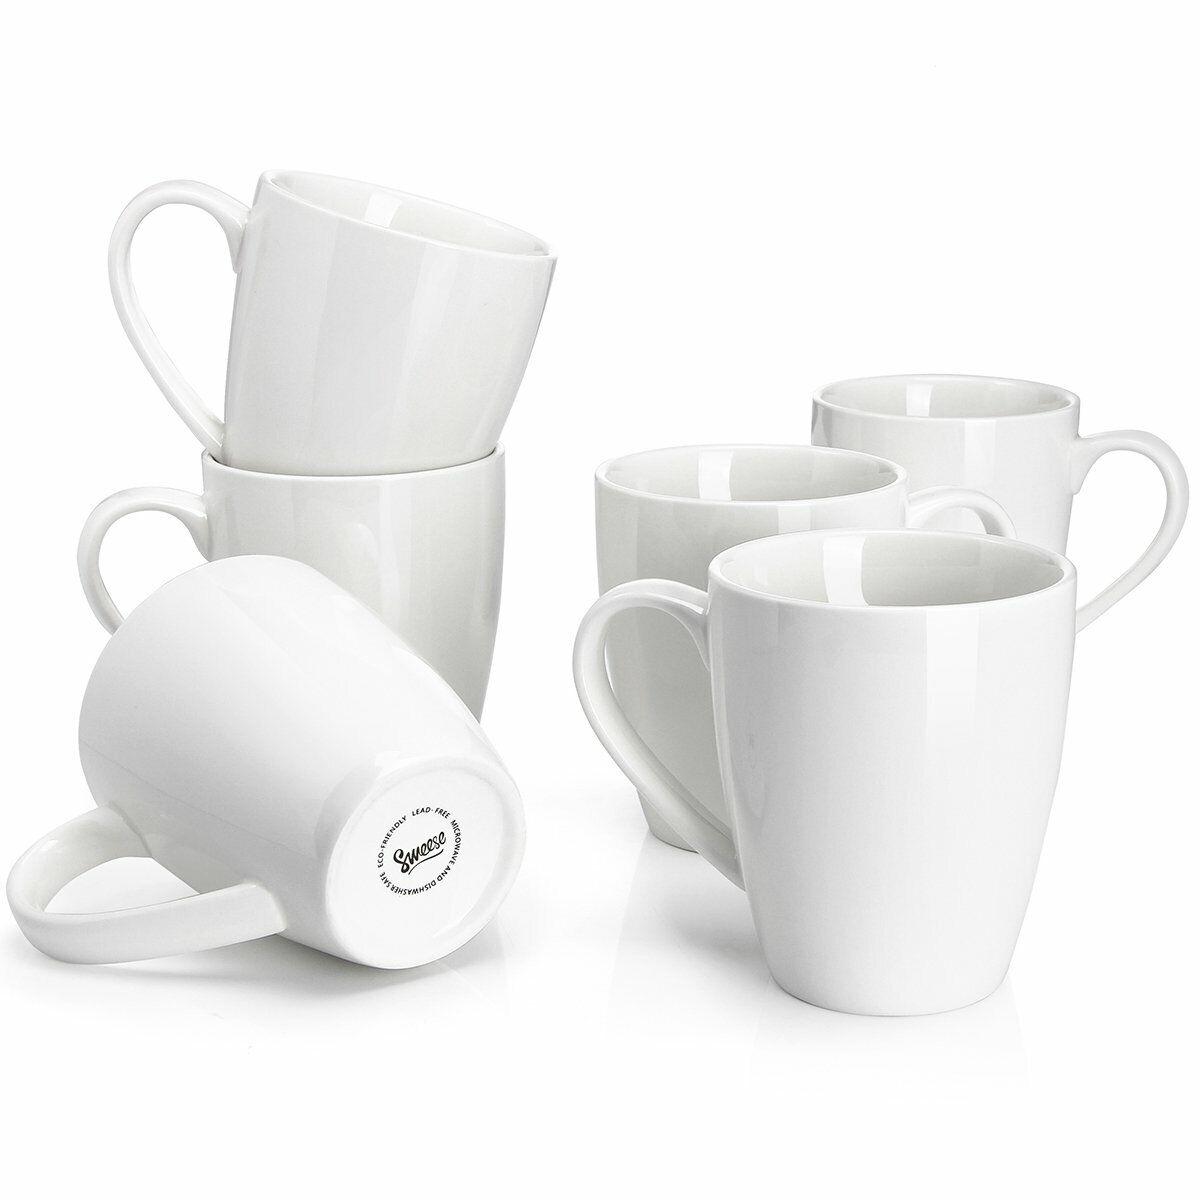 Sweese 6201 Porcelain Mugs - 16 Ounce for Coffee, Tea, Cocoa, Set of 6, White